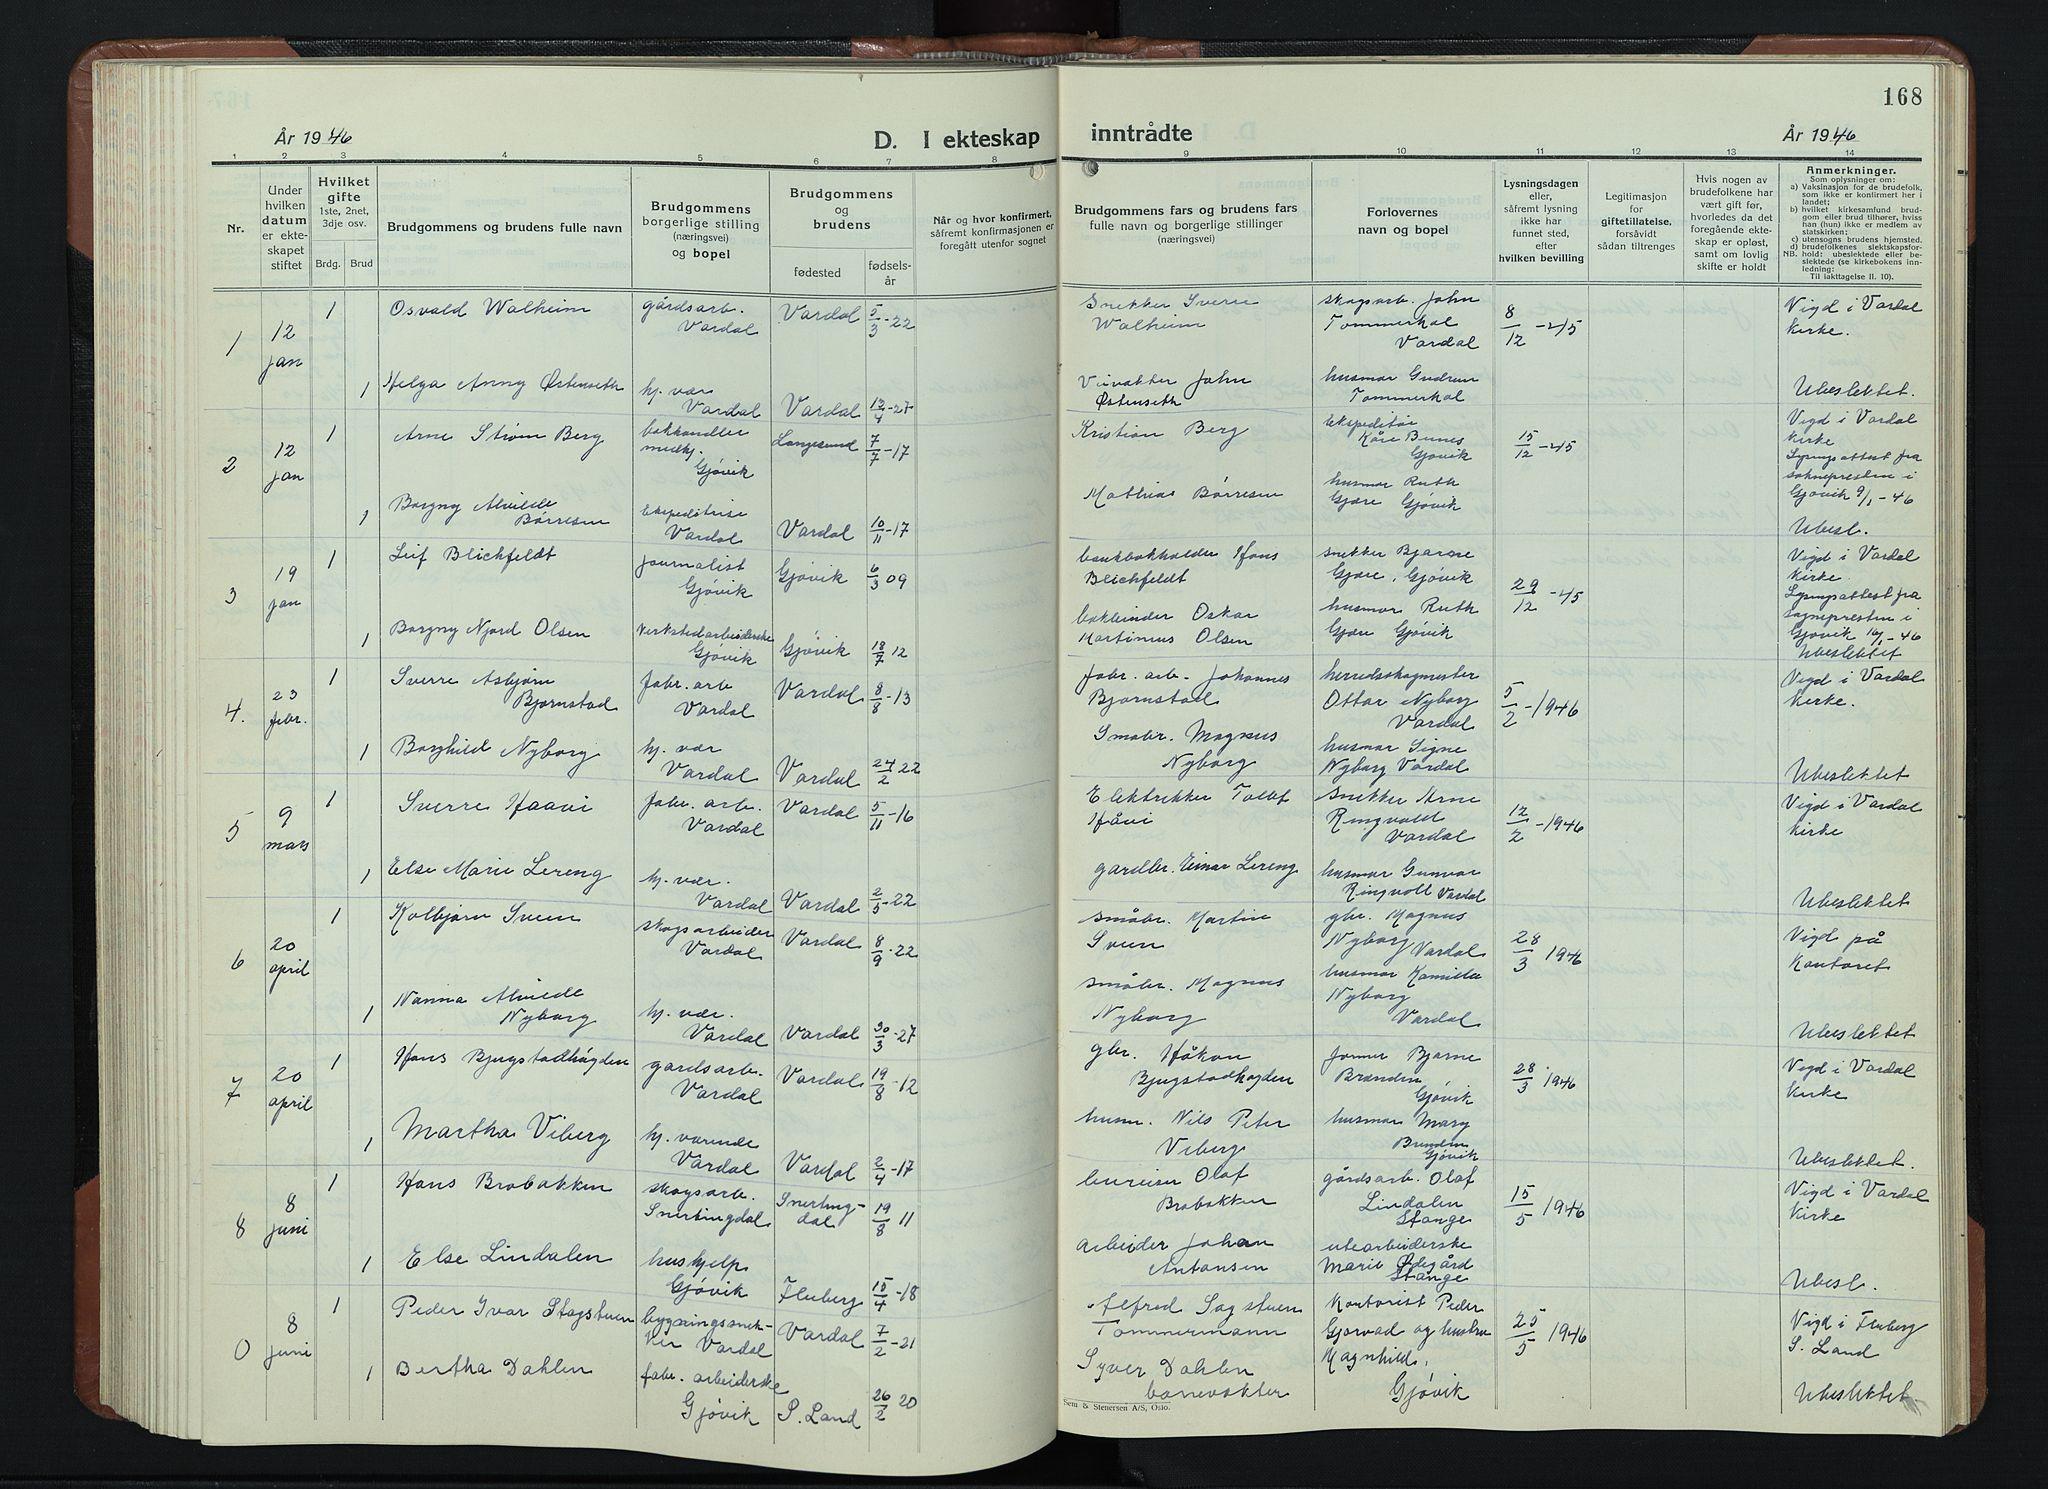 SAH, Vardal prestekontor, H/Ha/Hab/L0018: Klokkerbok nr. 18, 1931-1951, s. 168